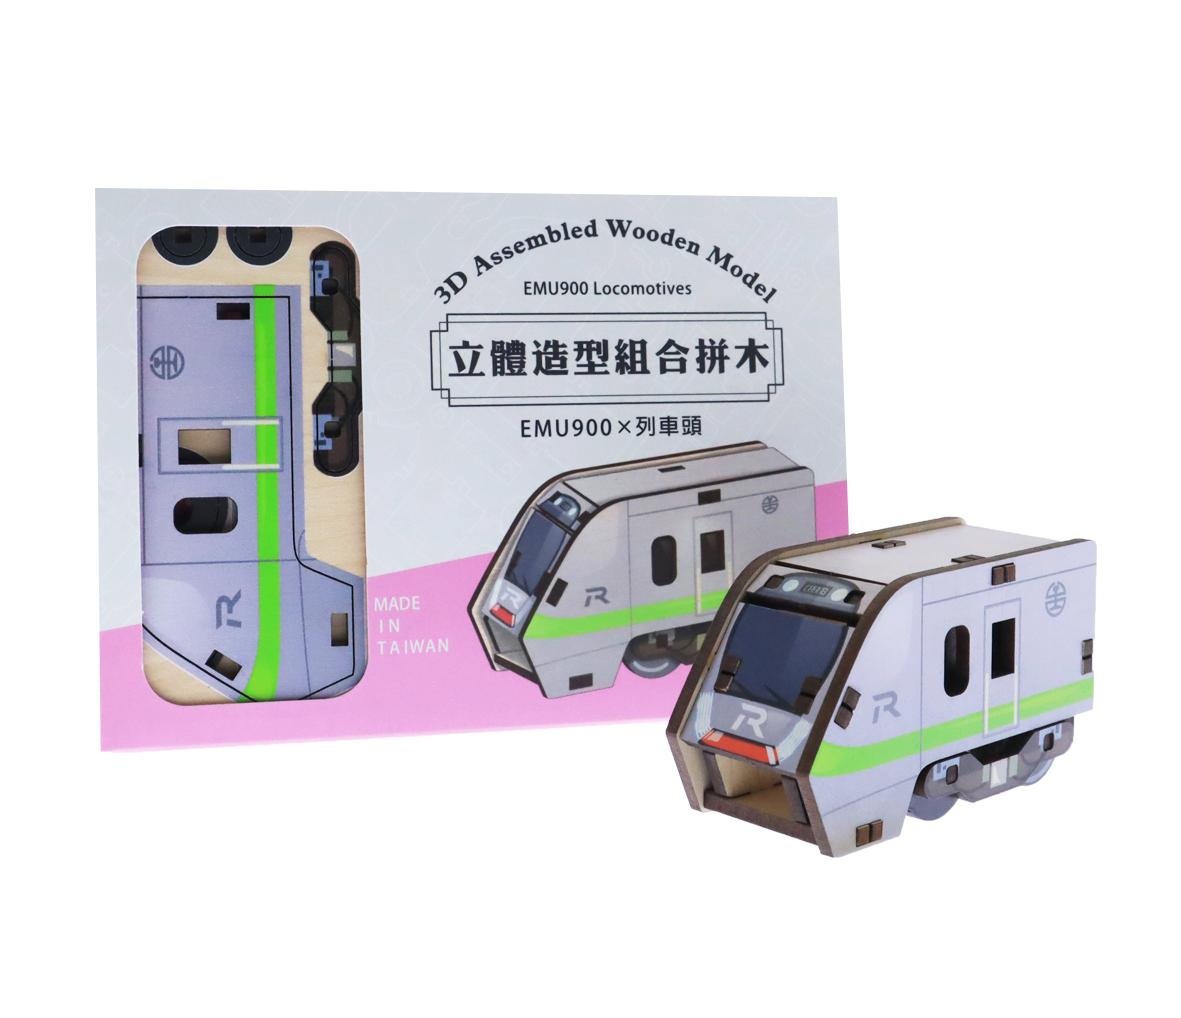 EMU900車頭立體組合拼木